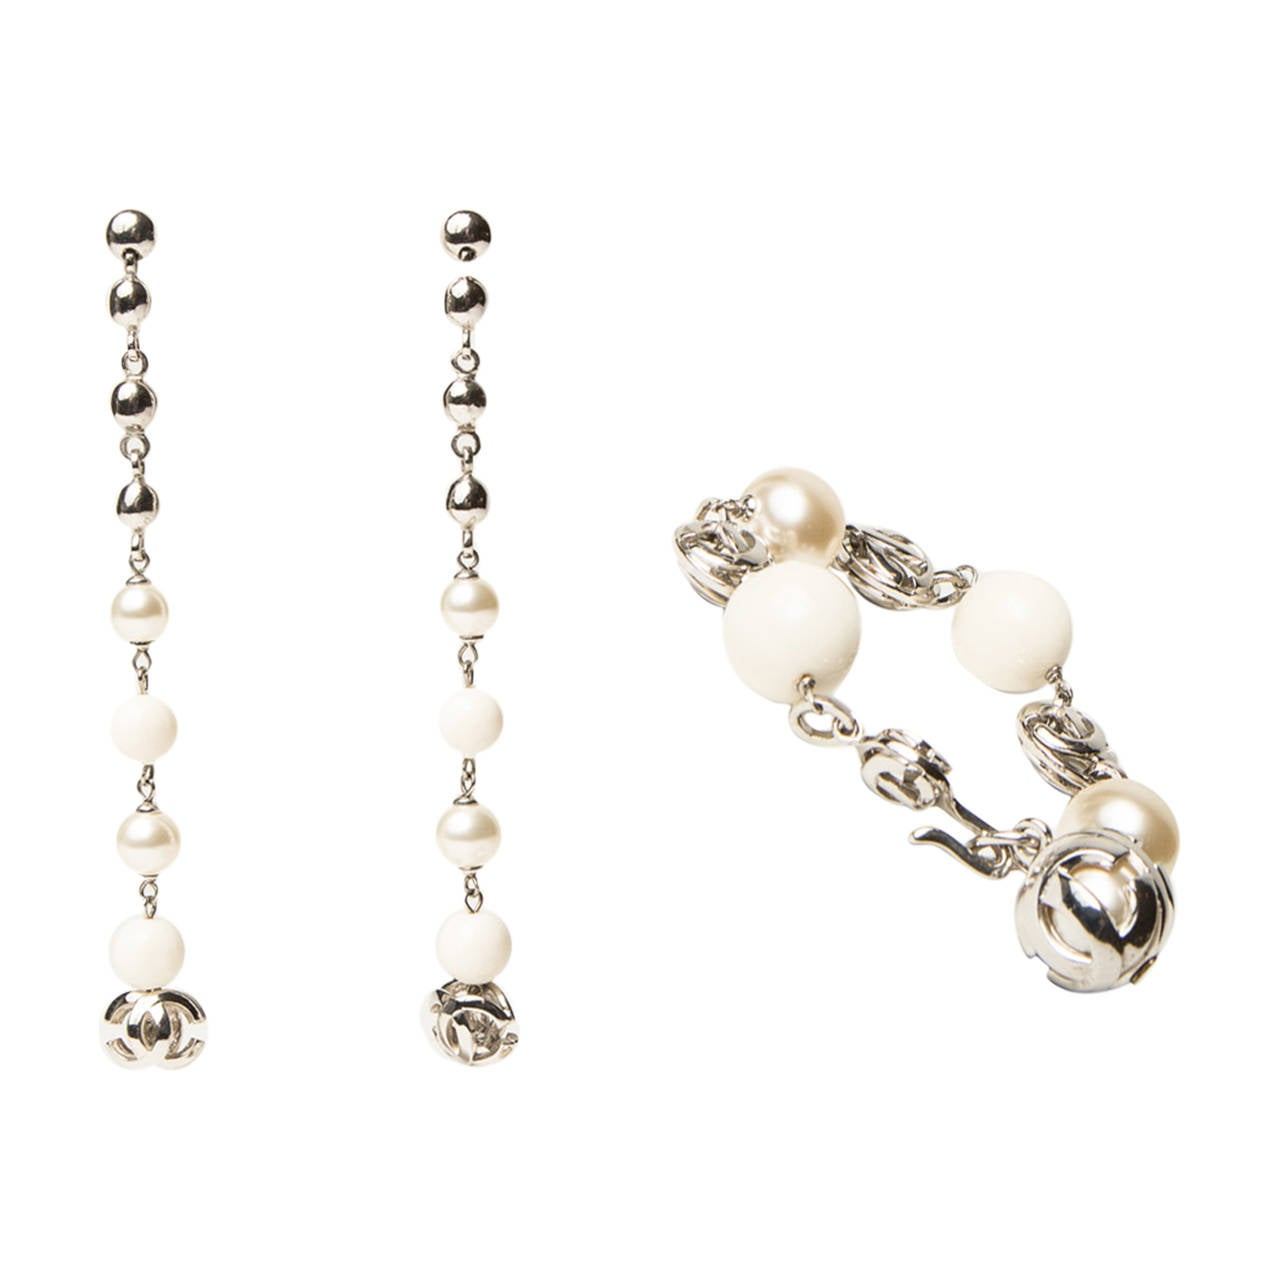 Chanel Pearl Earring and Bracelet Set 1